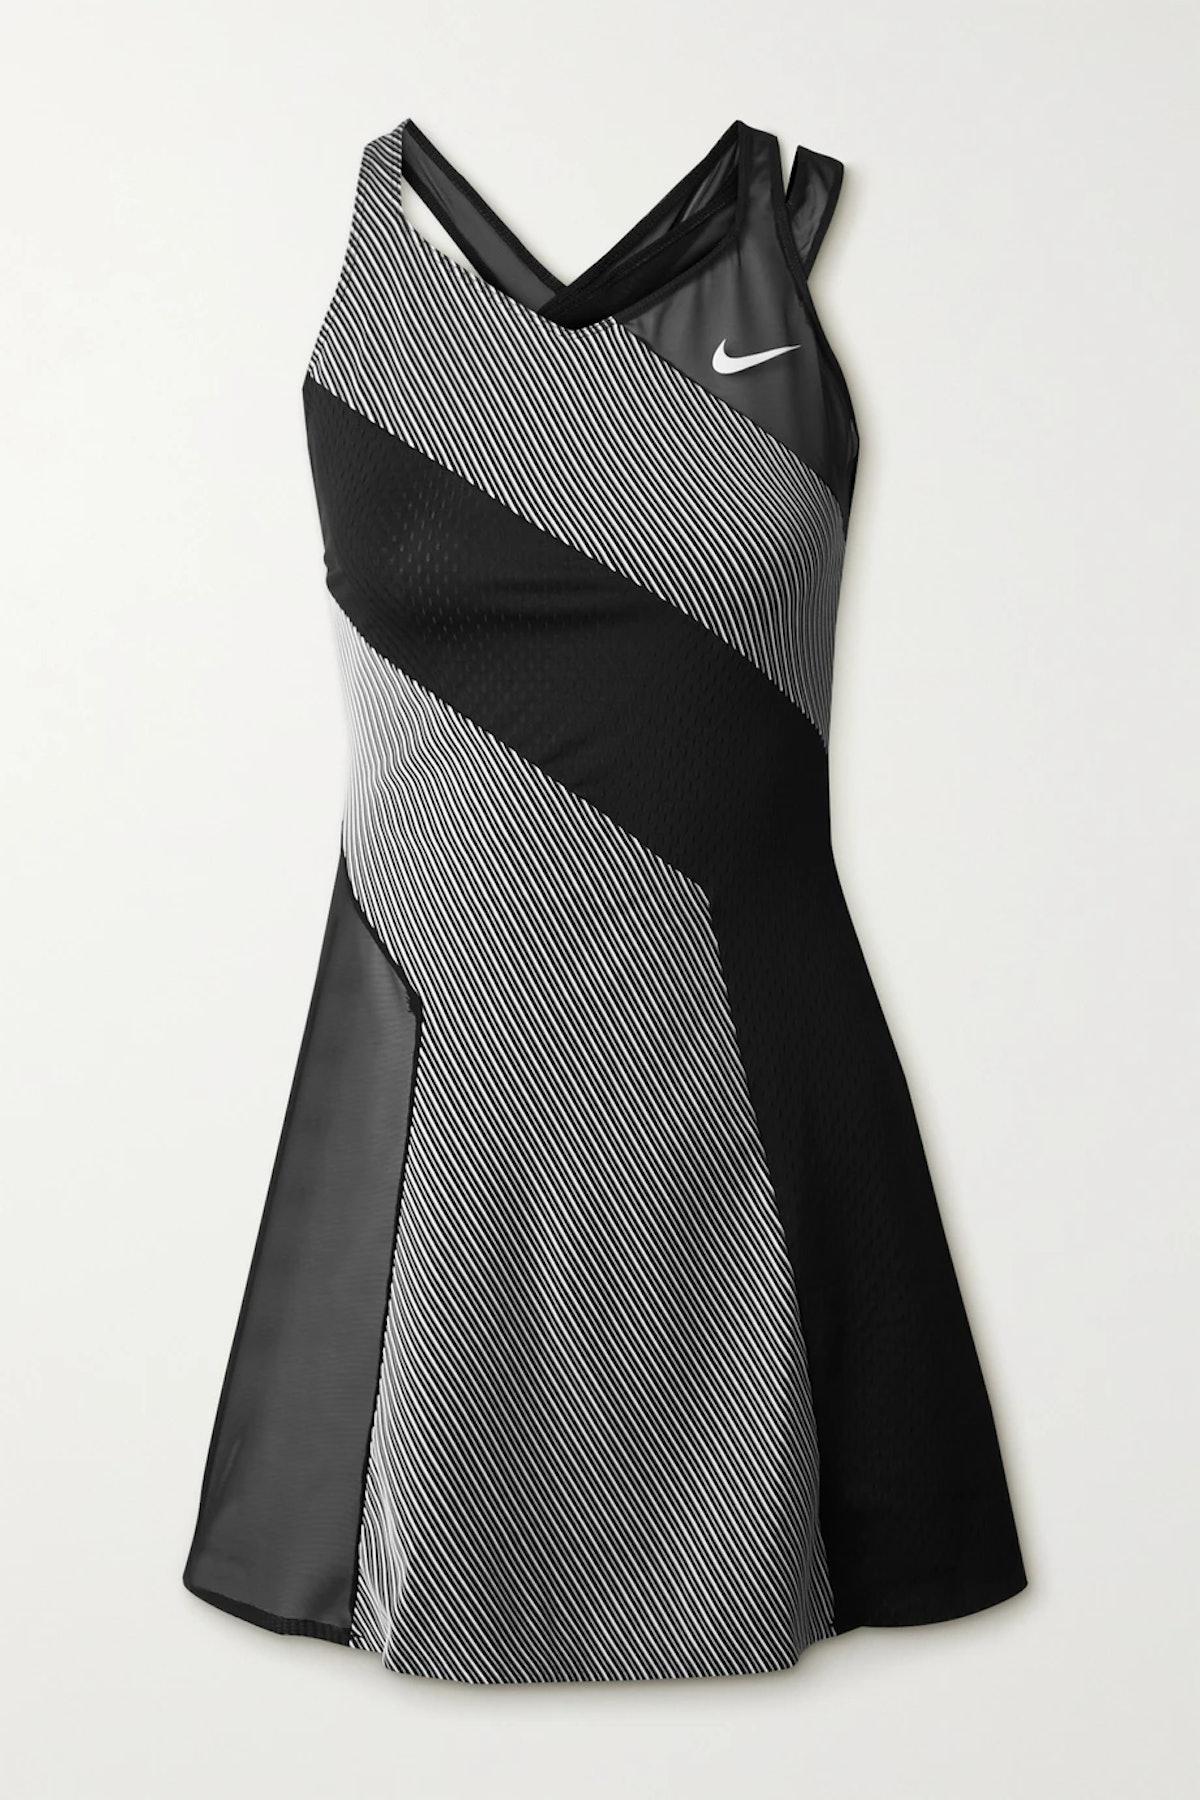 Nike x Naomi Osaka Tennis Dress